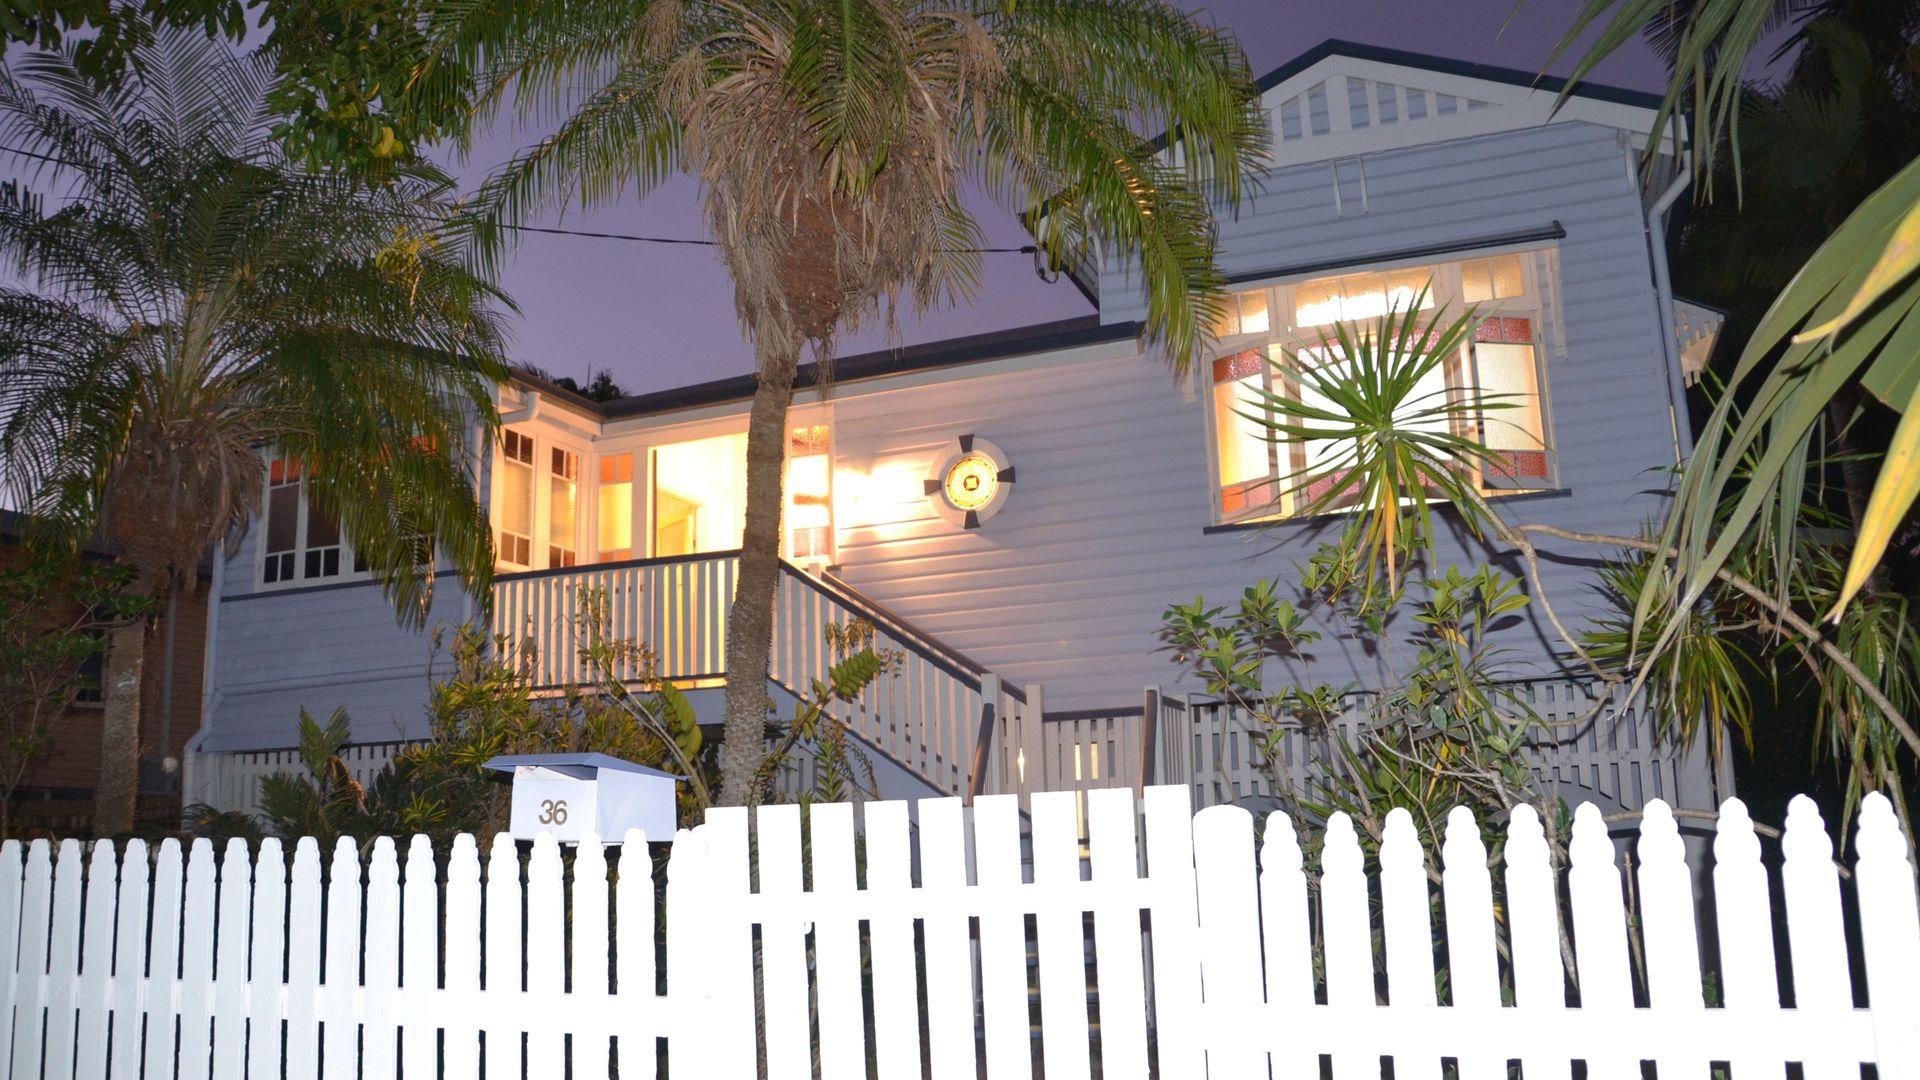 36 George Street, Mackay QLD 4740, Image 1